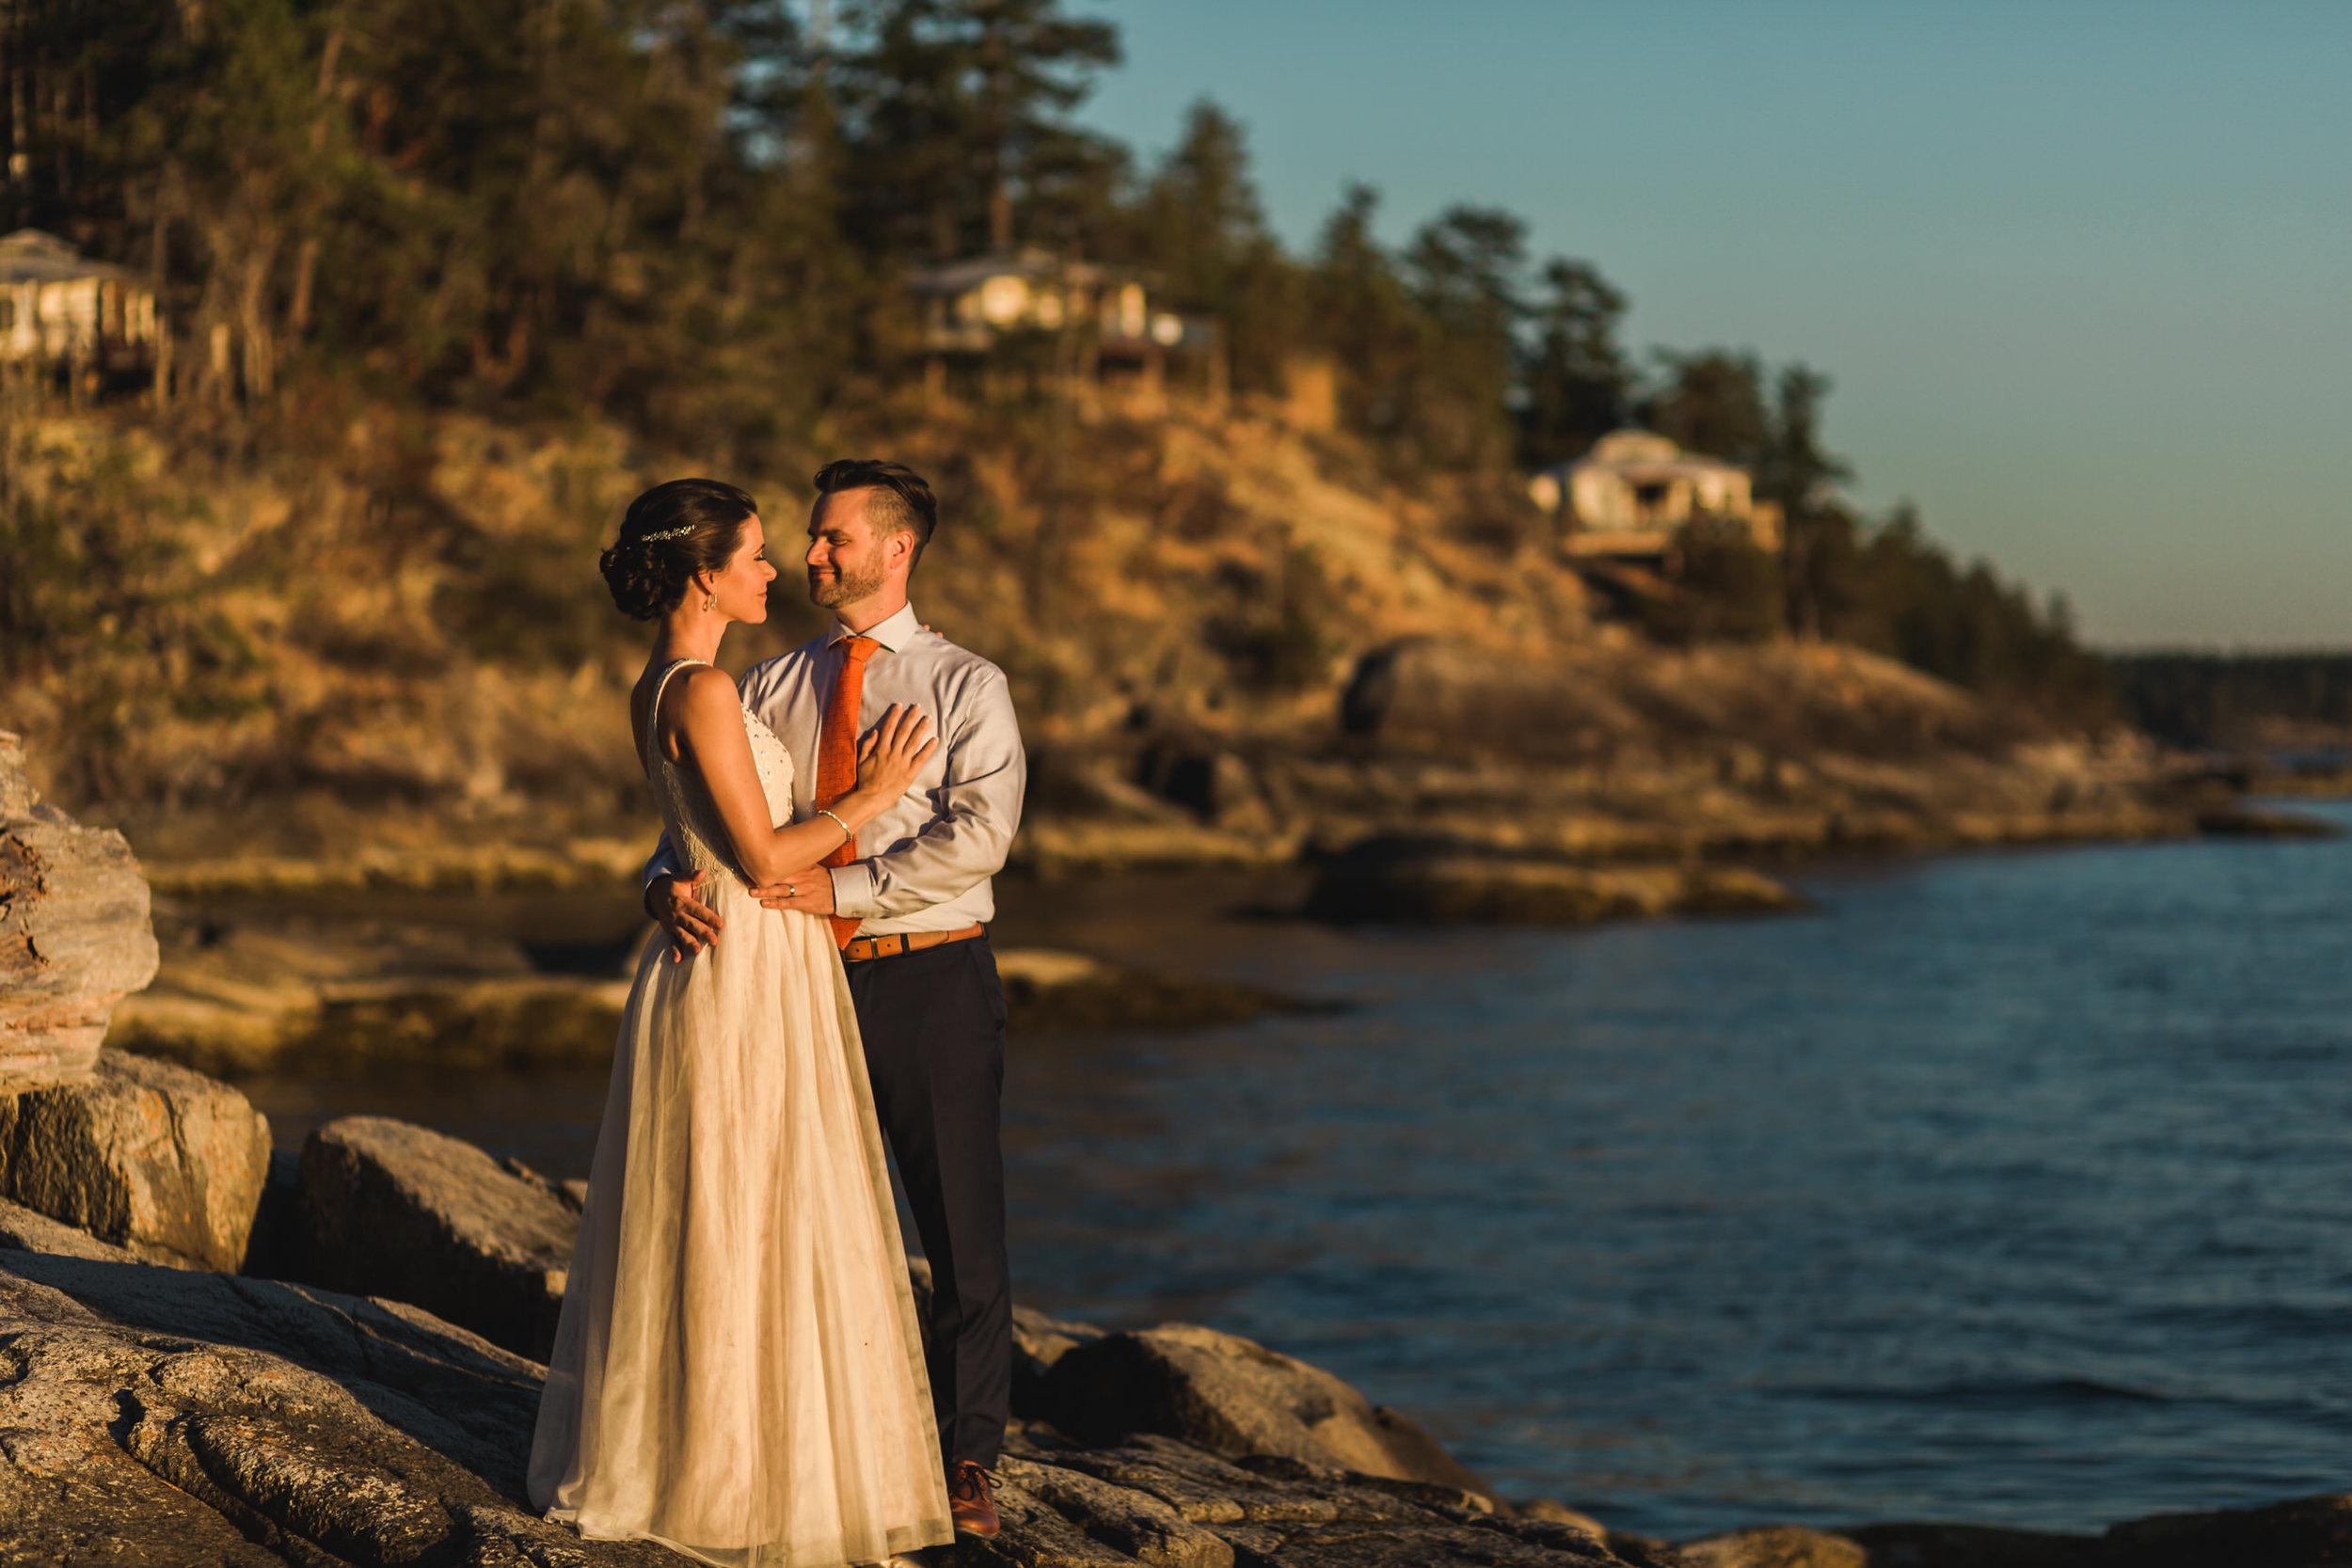 Rockwater Secret Cove Resort Wedding - Sunshine Coast BC Wedding Photographer - Vancouver Wedding Photographer - Sunshine Coast Elopement Photos - IMG_2068.jpg